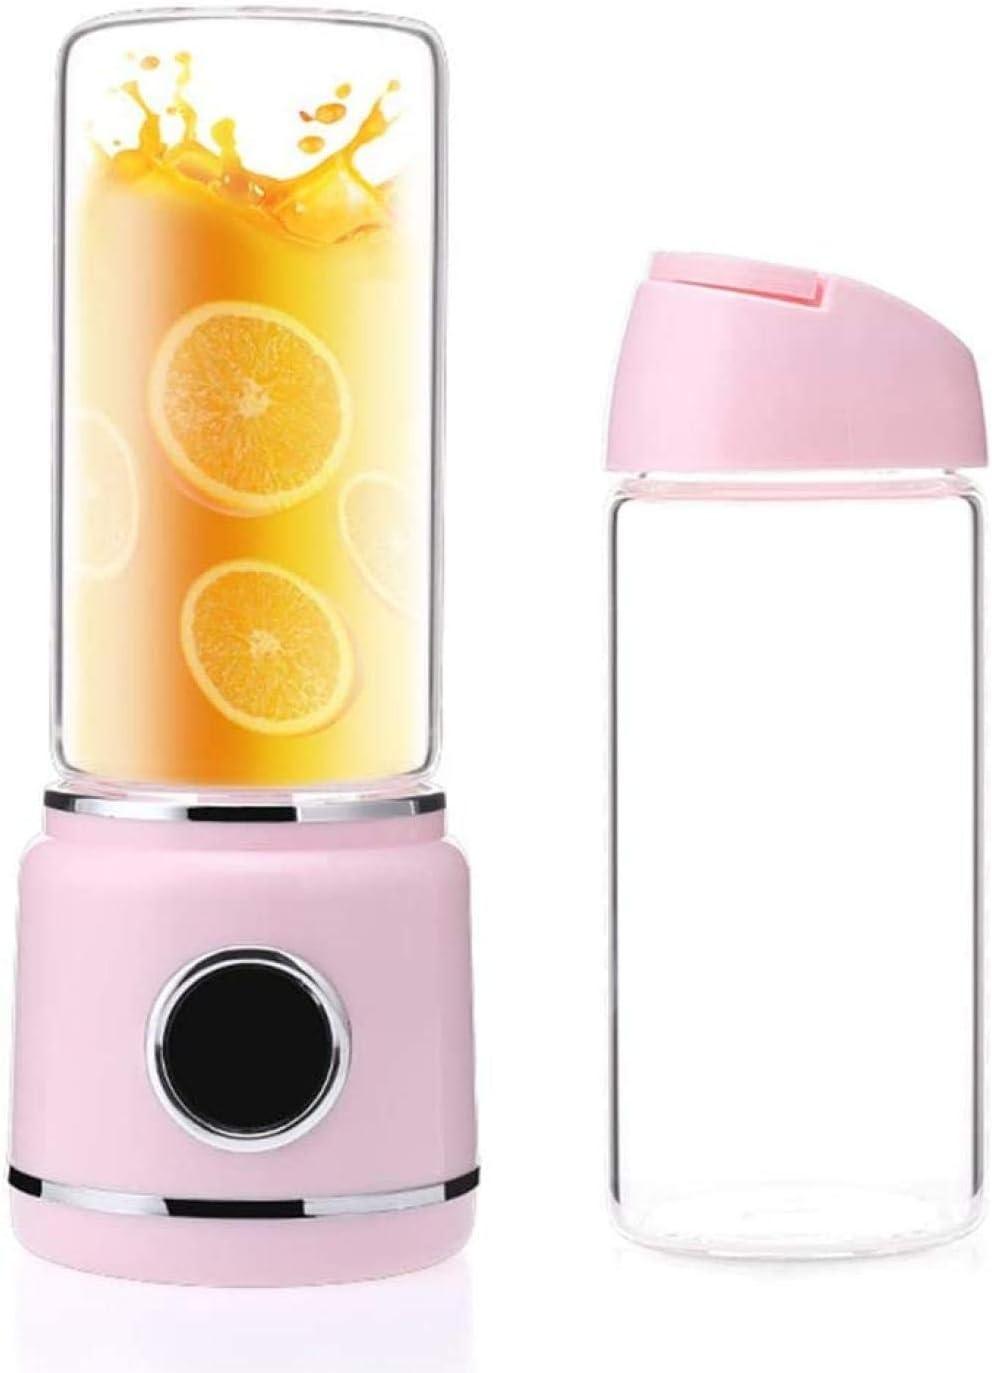 ASDASD Licuadora de Jugo portátil con batería Recargable USB 4000Ma Botella de Agua de Viaje al Aire Libre con Banco de energía con Pantalla LED LED Regalo Deportivo de Salud Rosa-Rosado